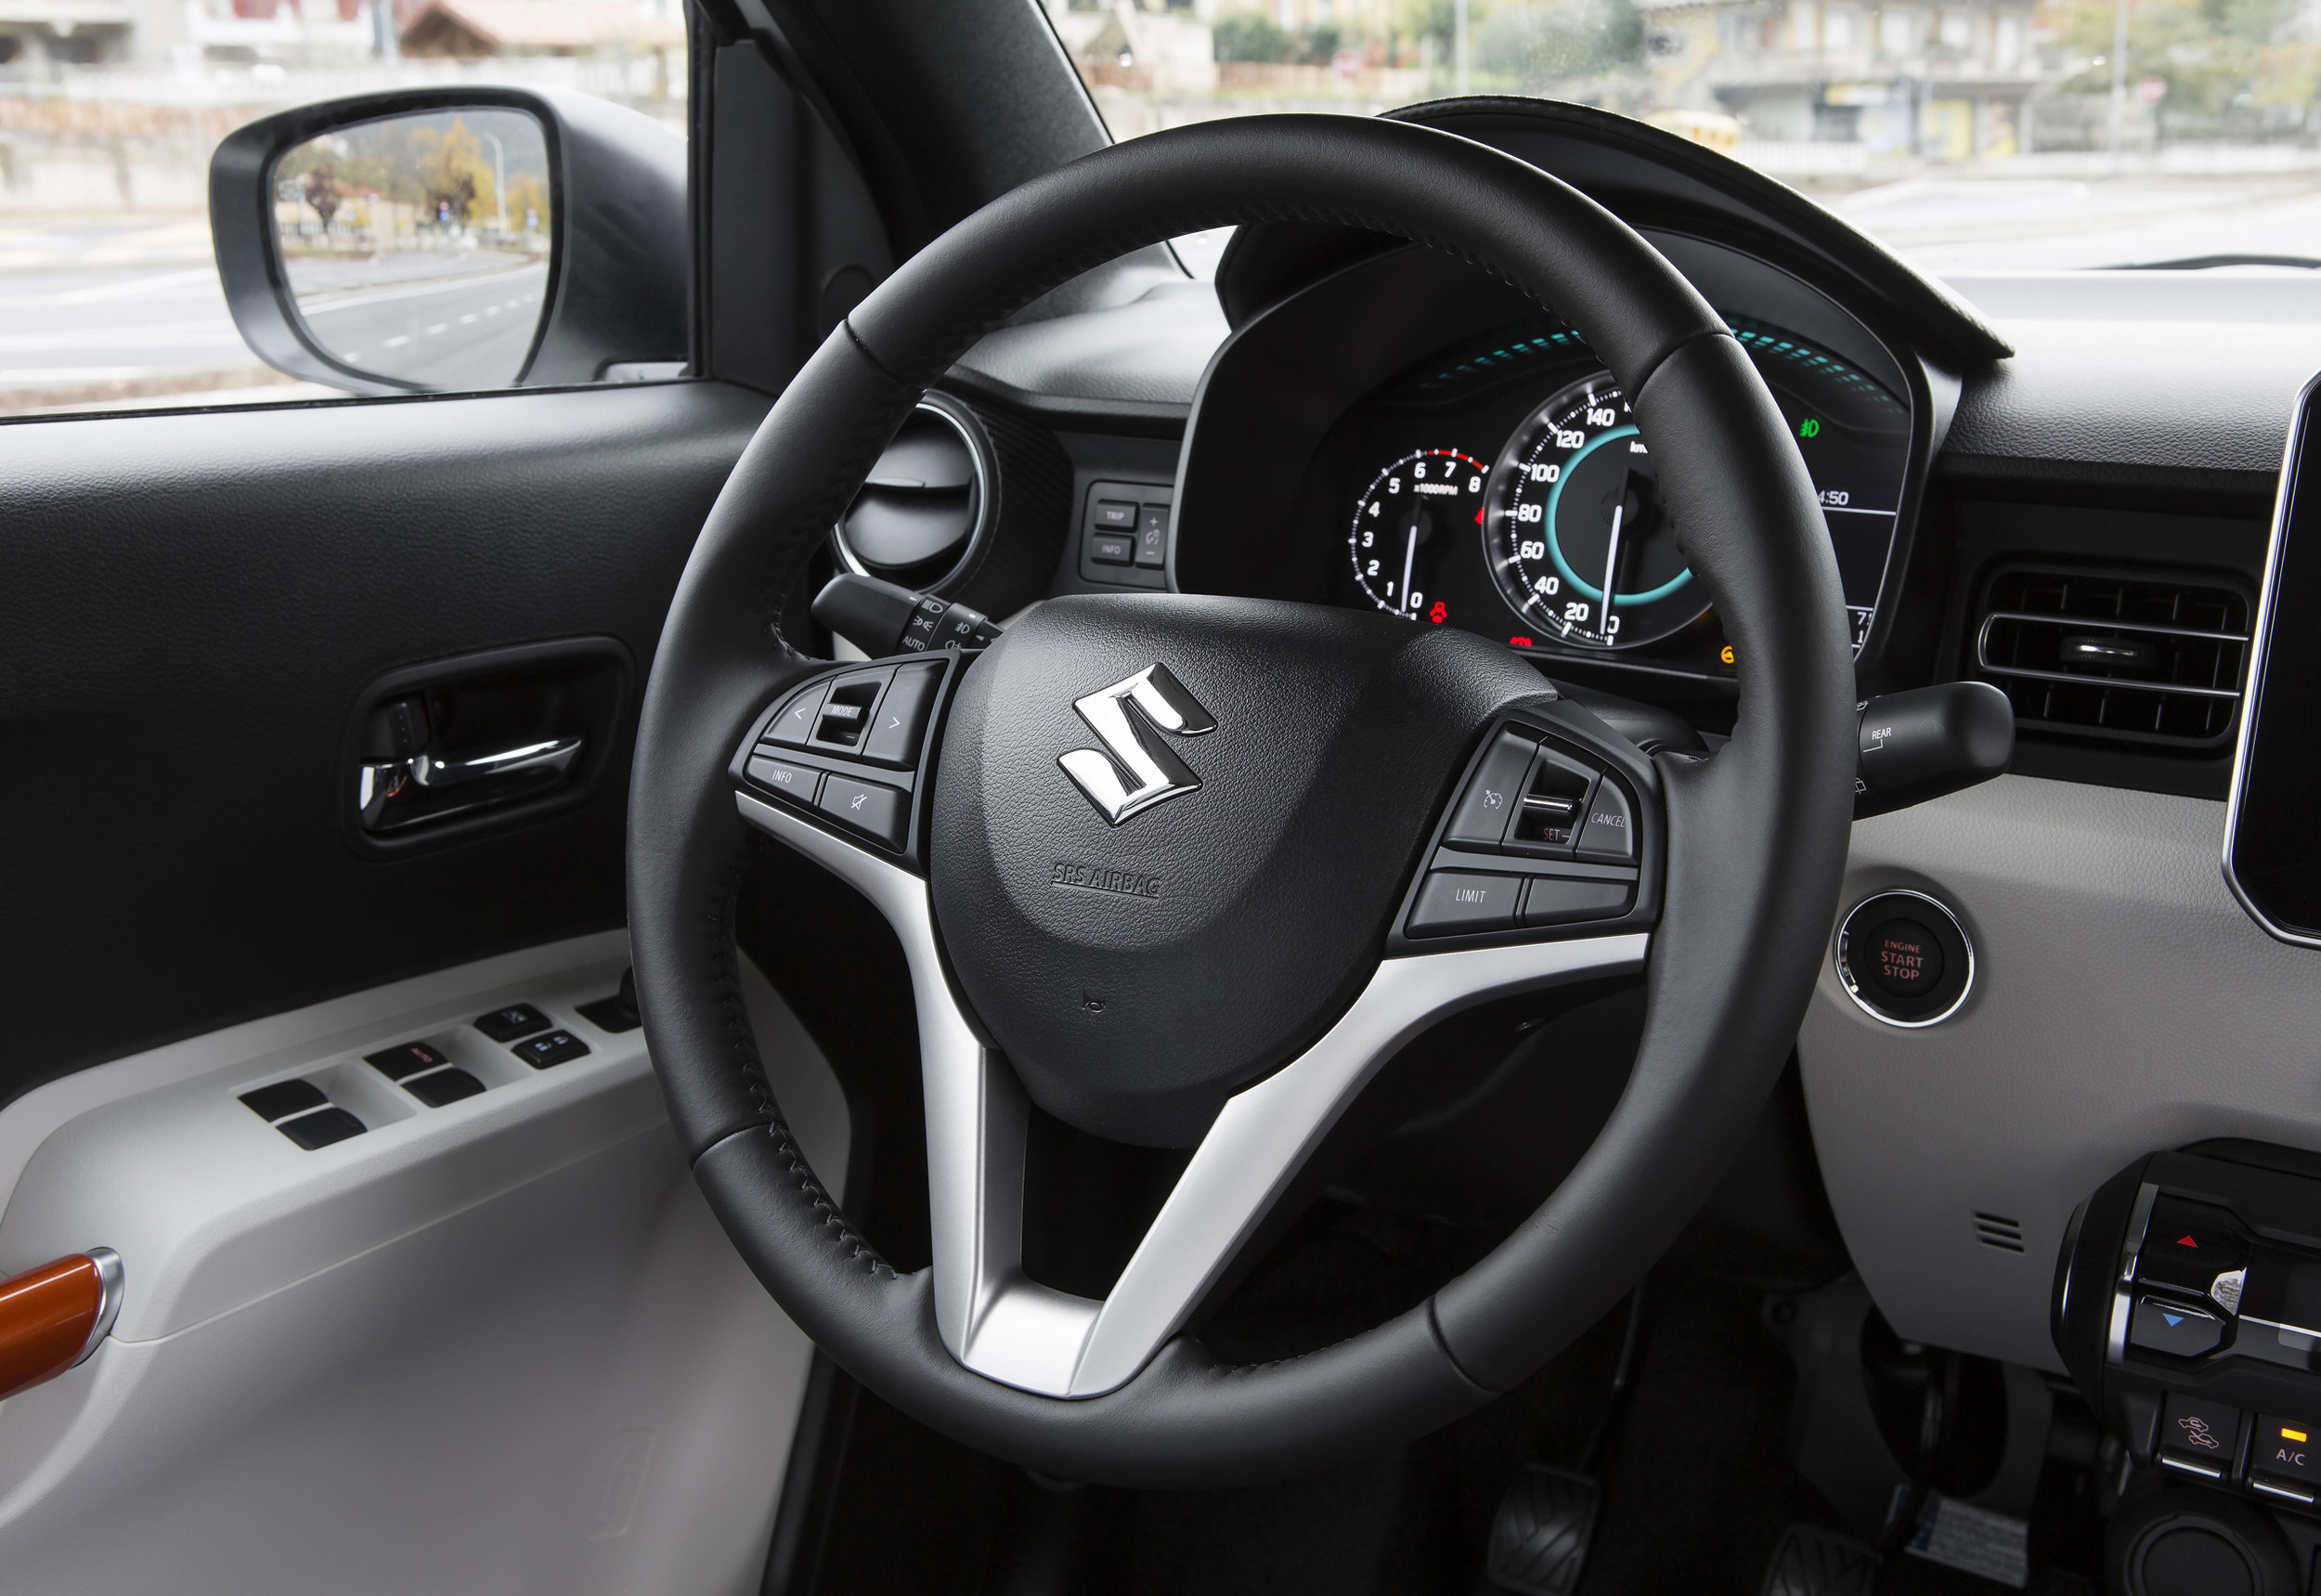 Interior---Steering-Wheel.jpg